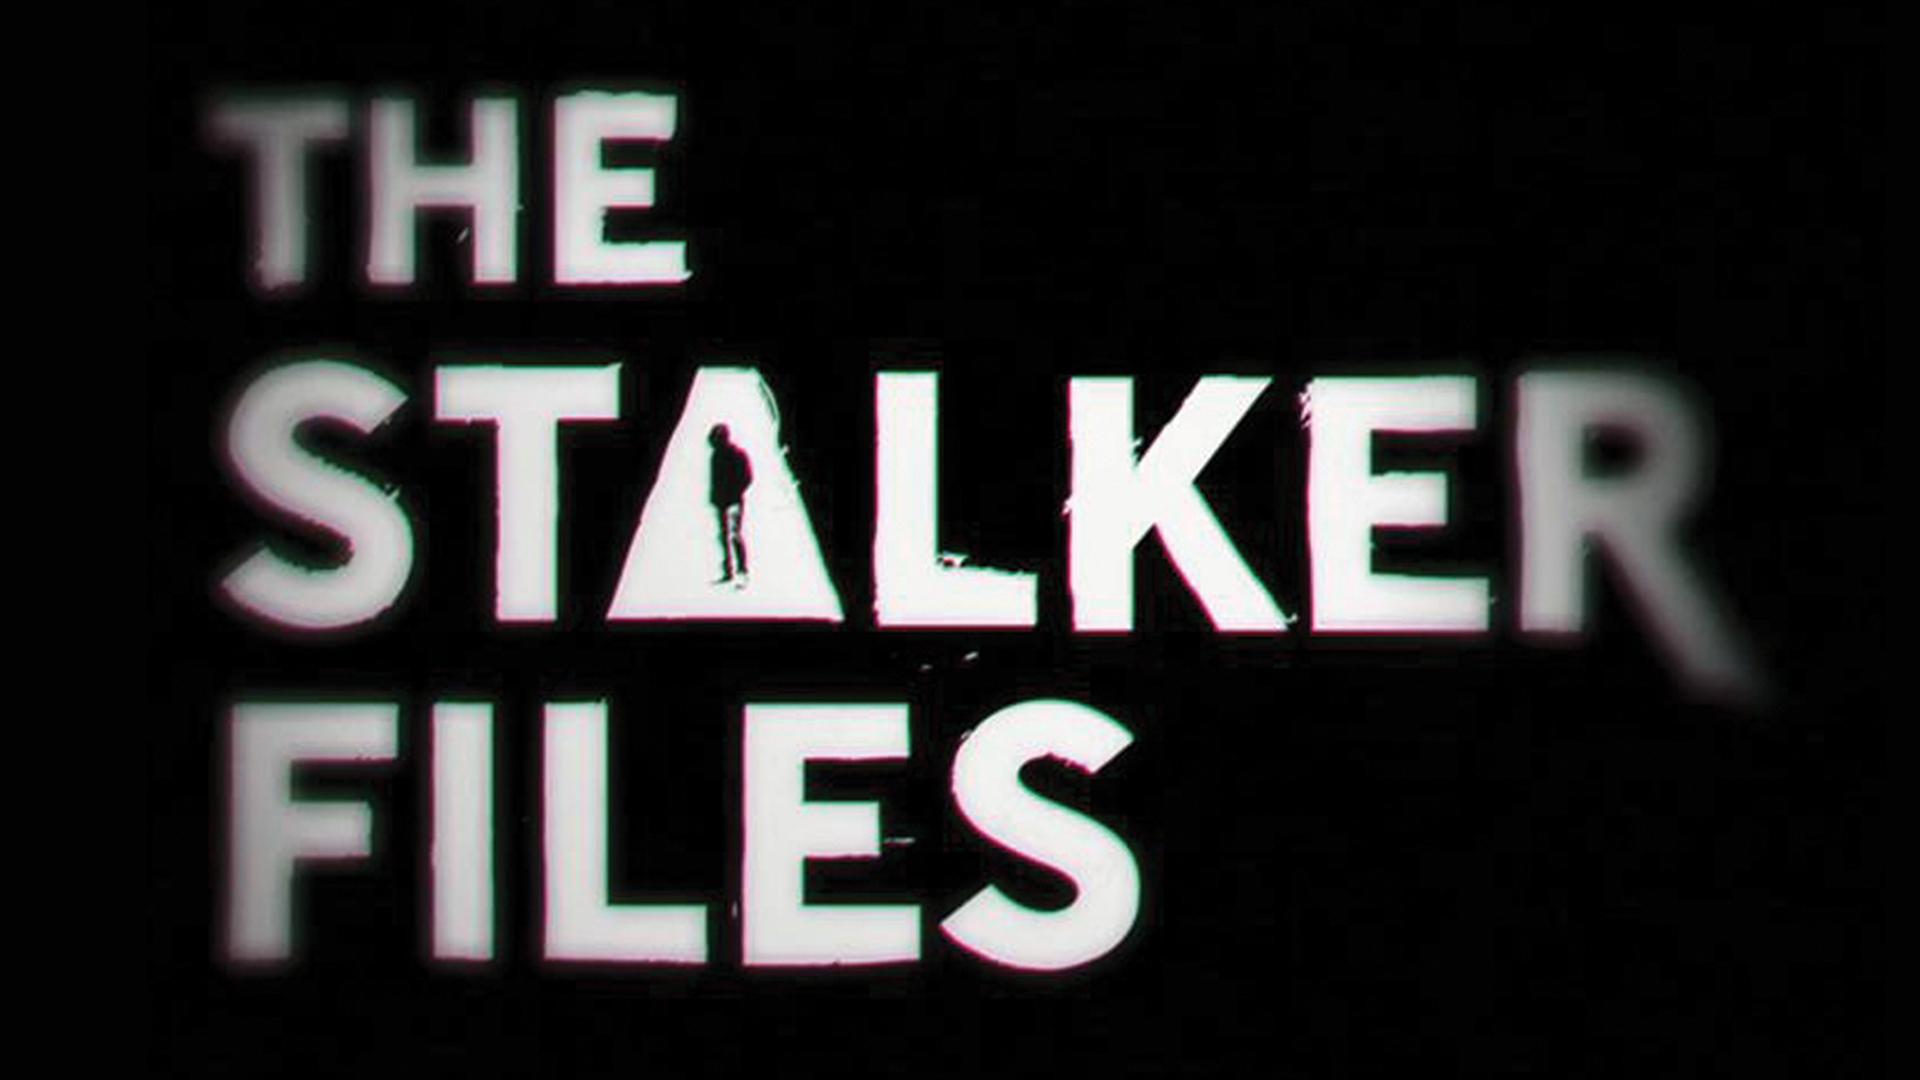 The Stalker Files